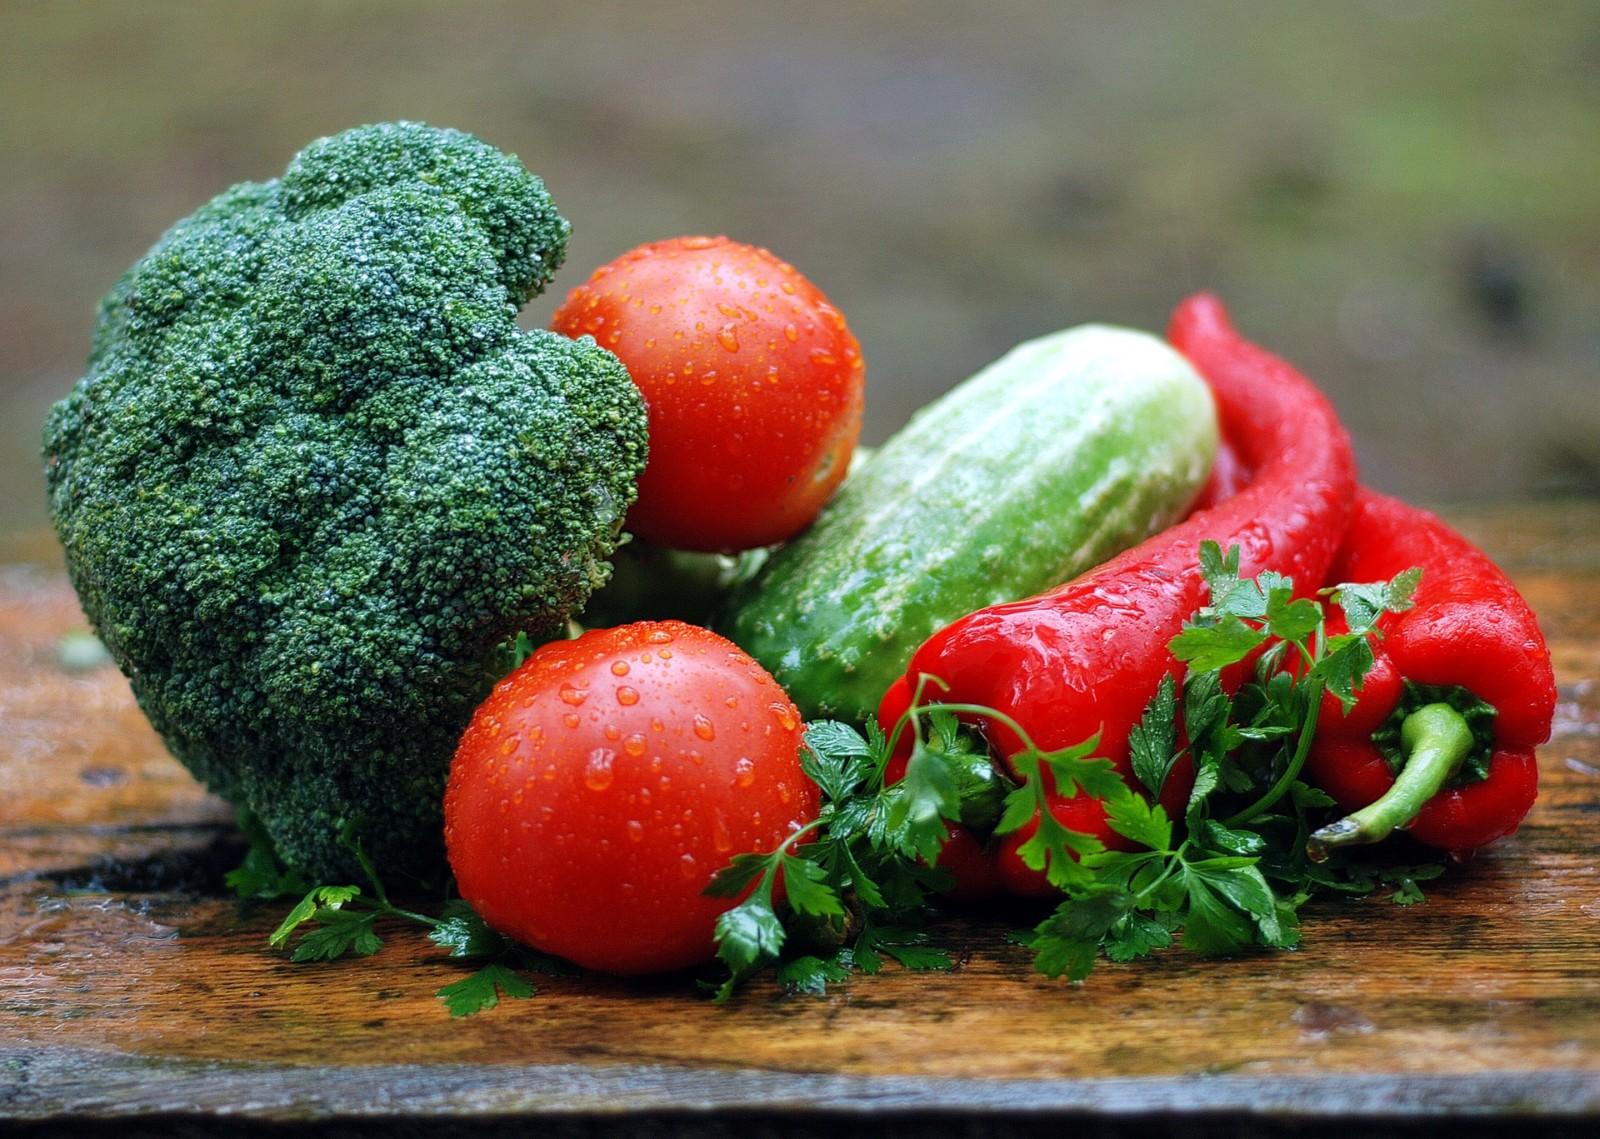 разгрузка на овощах